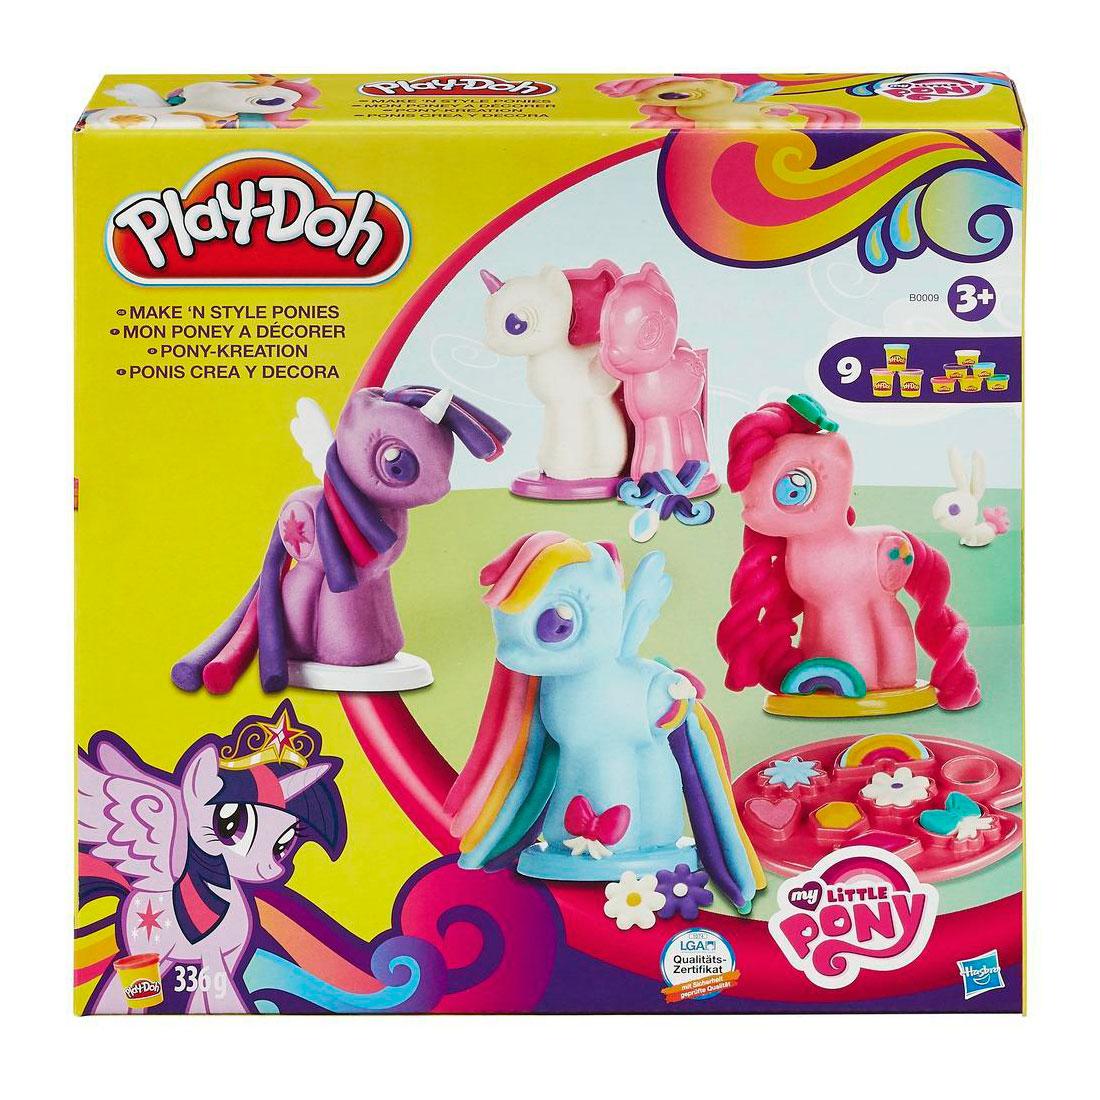 ������� ����� Play-Doh ������ ������� ����